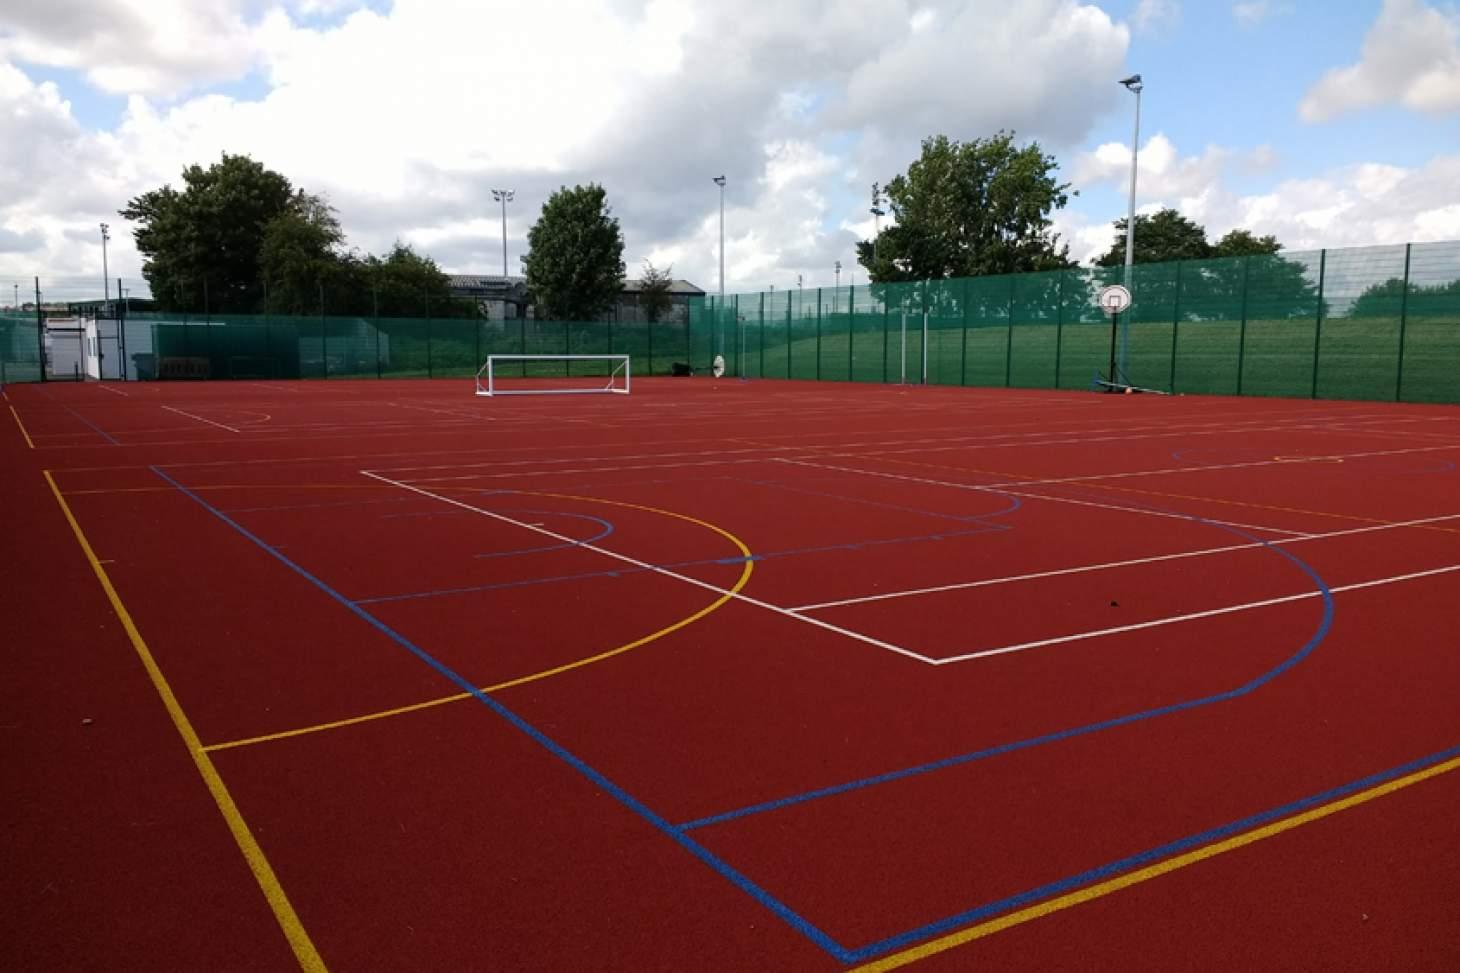 Oasis Academy Arena Outdoor   Hard (macadam) netball court